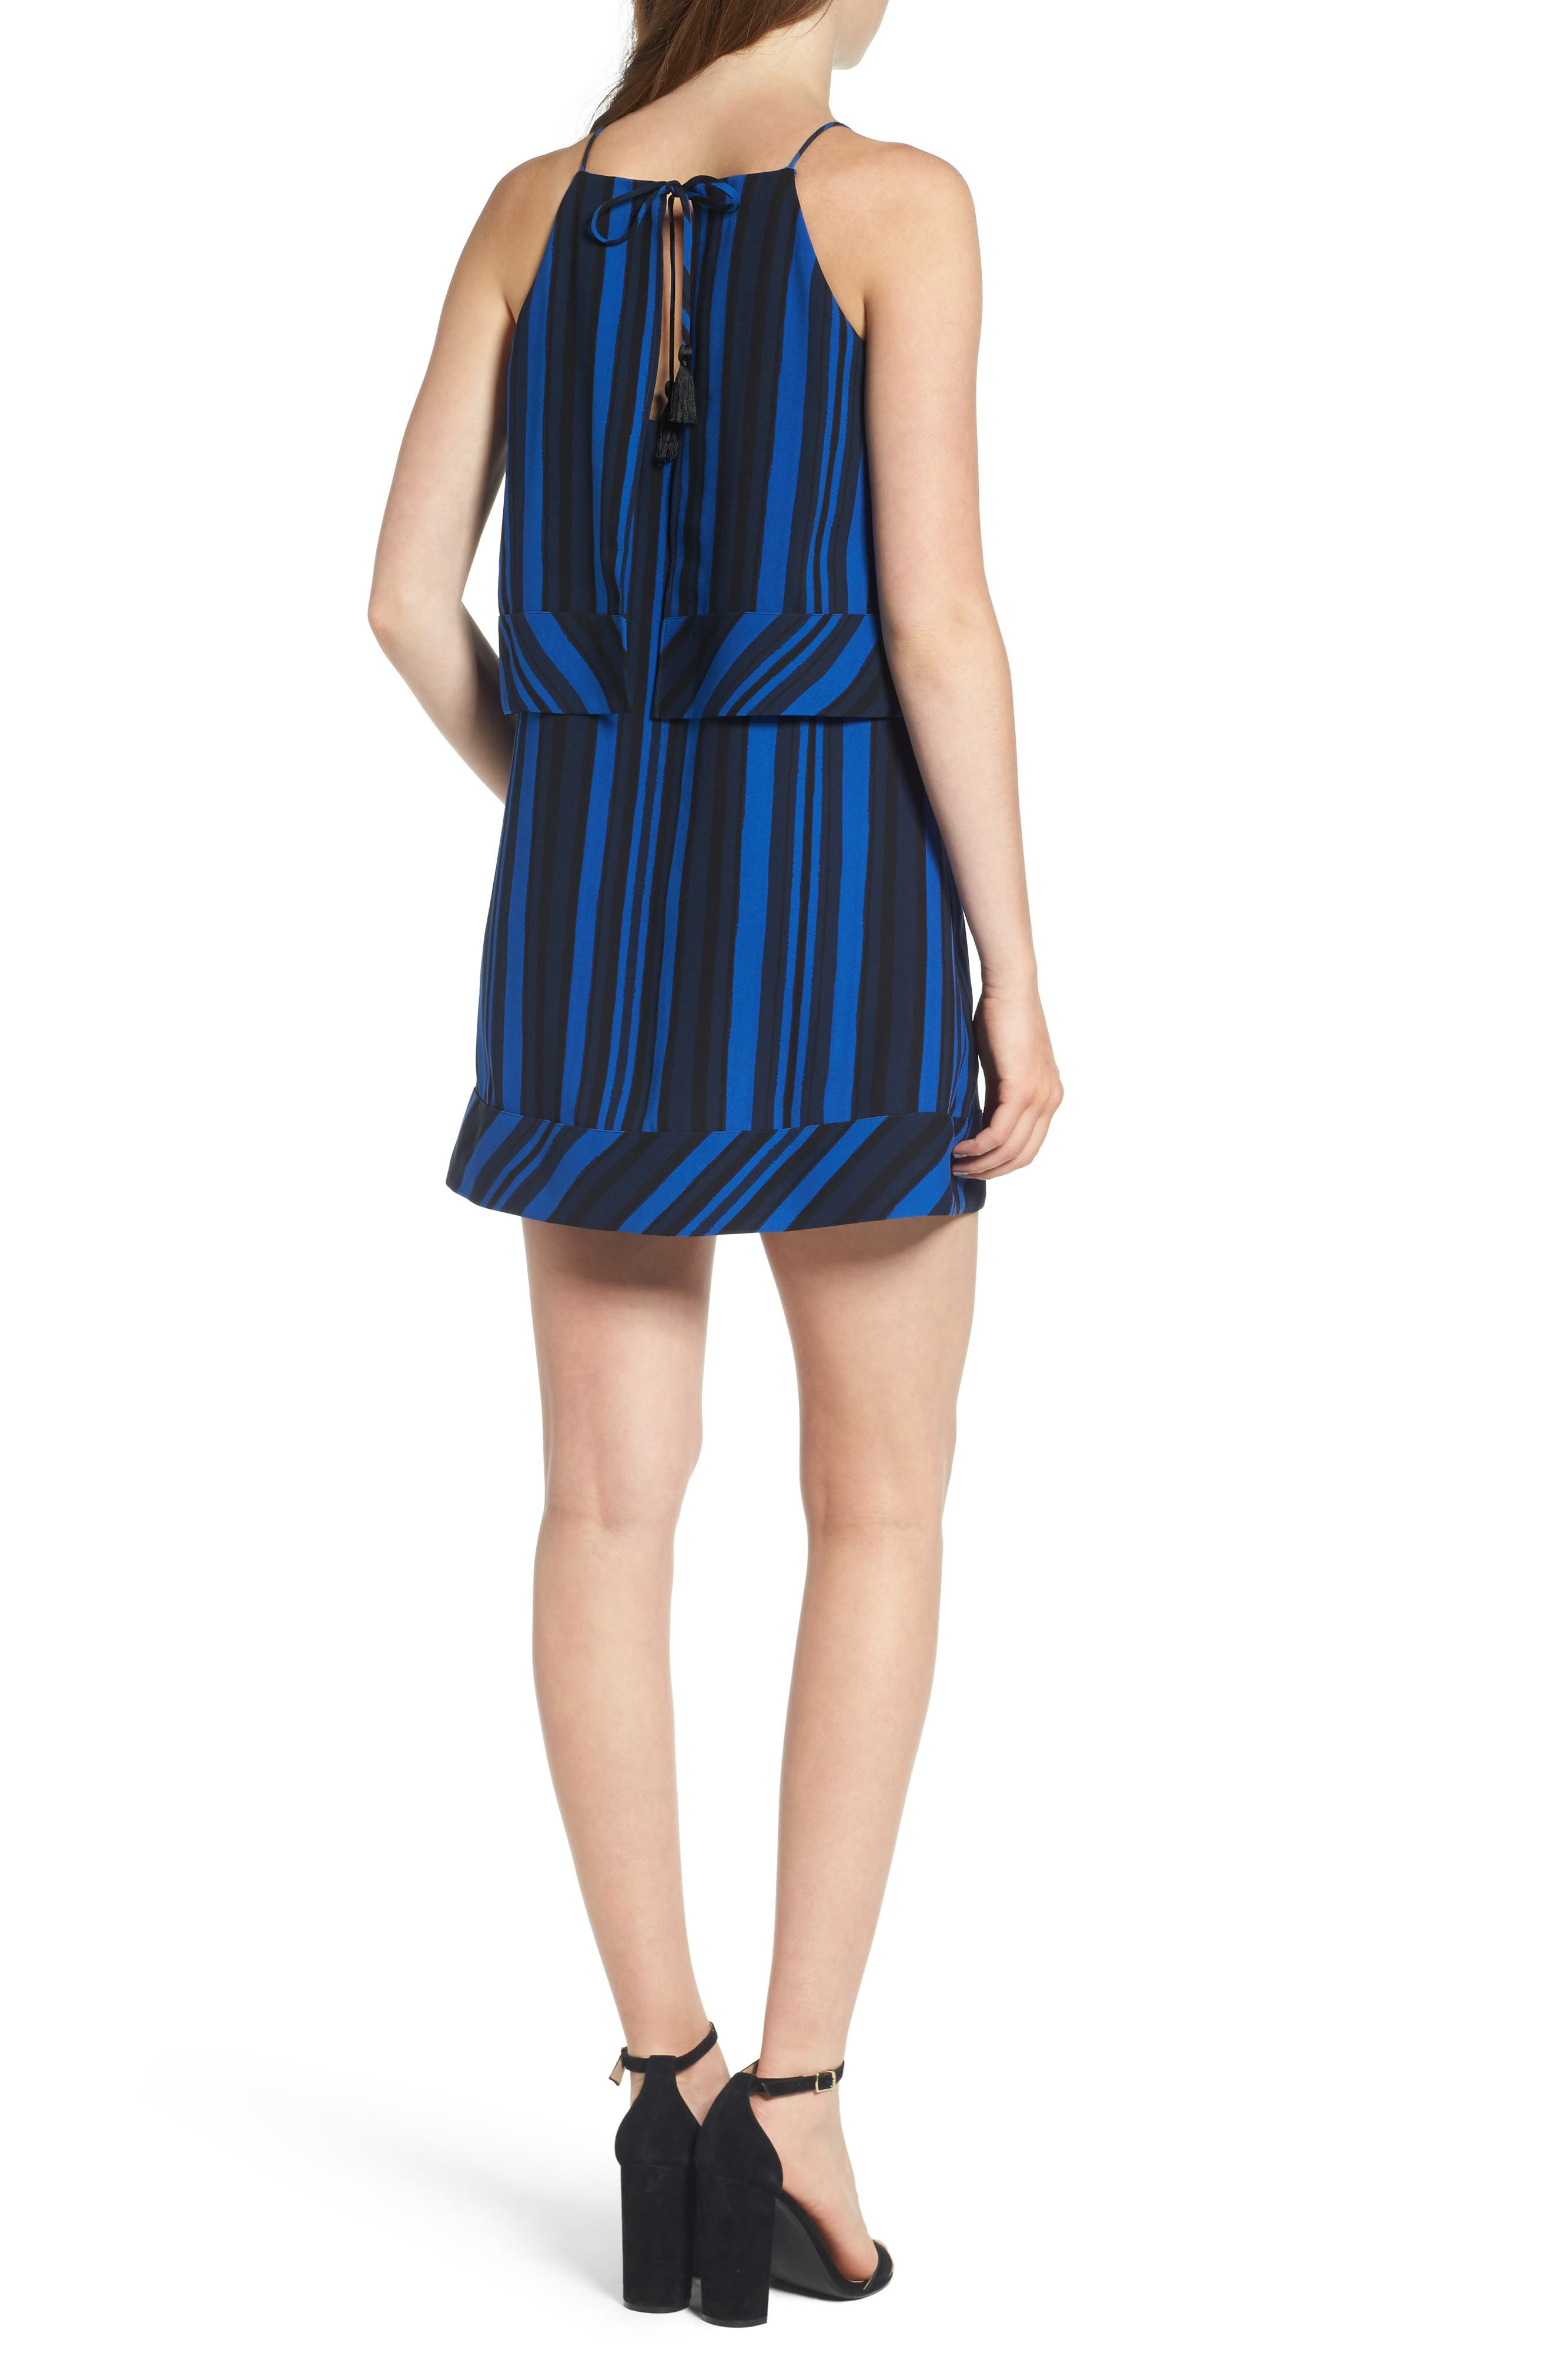 Callie Tiered Shift Dress,                             Alternate thumbnail 2, color,                             Blue Stripe Print